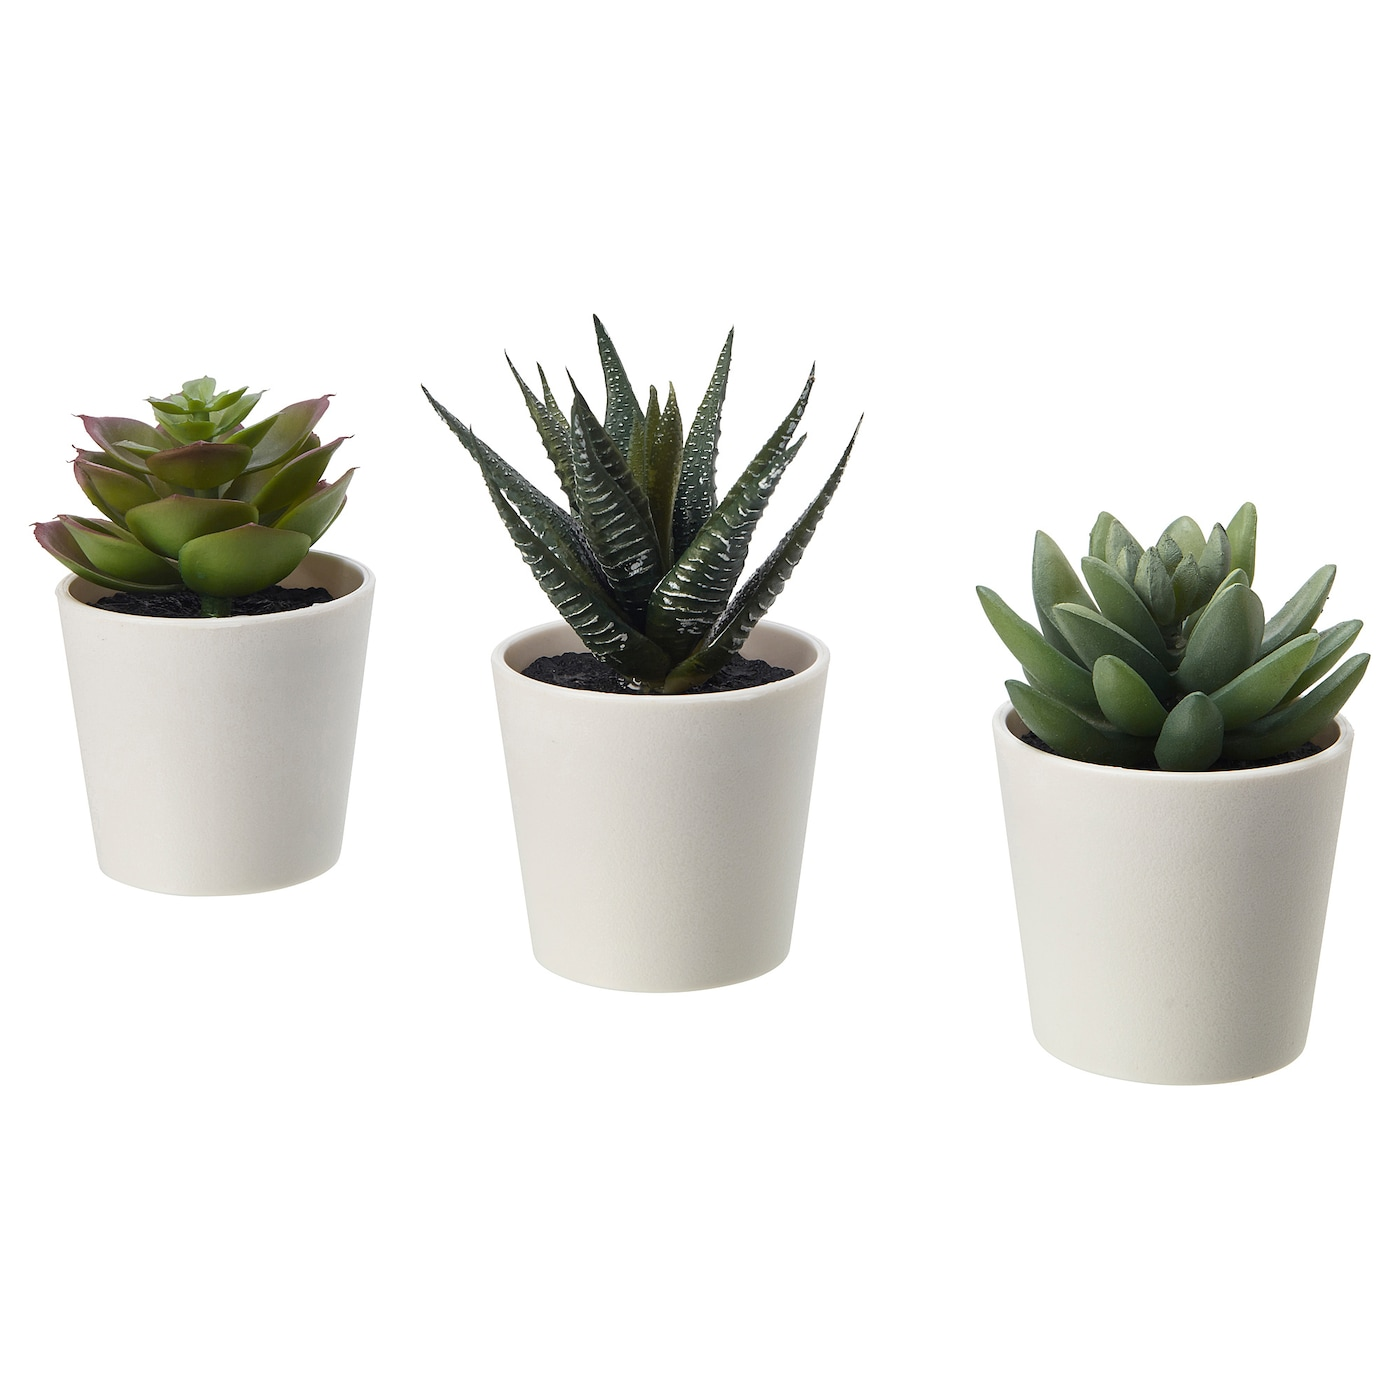 FEJKA フェイカ 人工観葉植物 鉢カバー付き